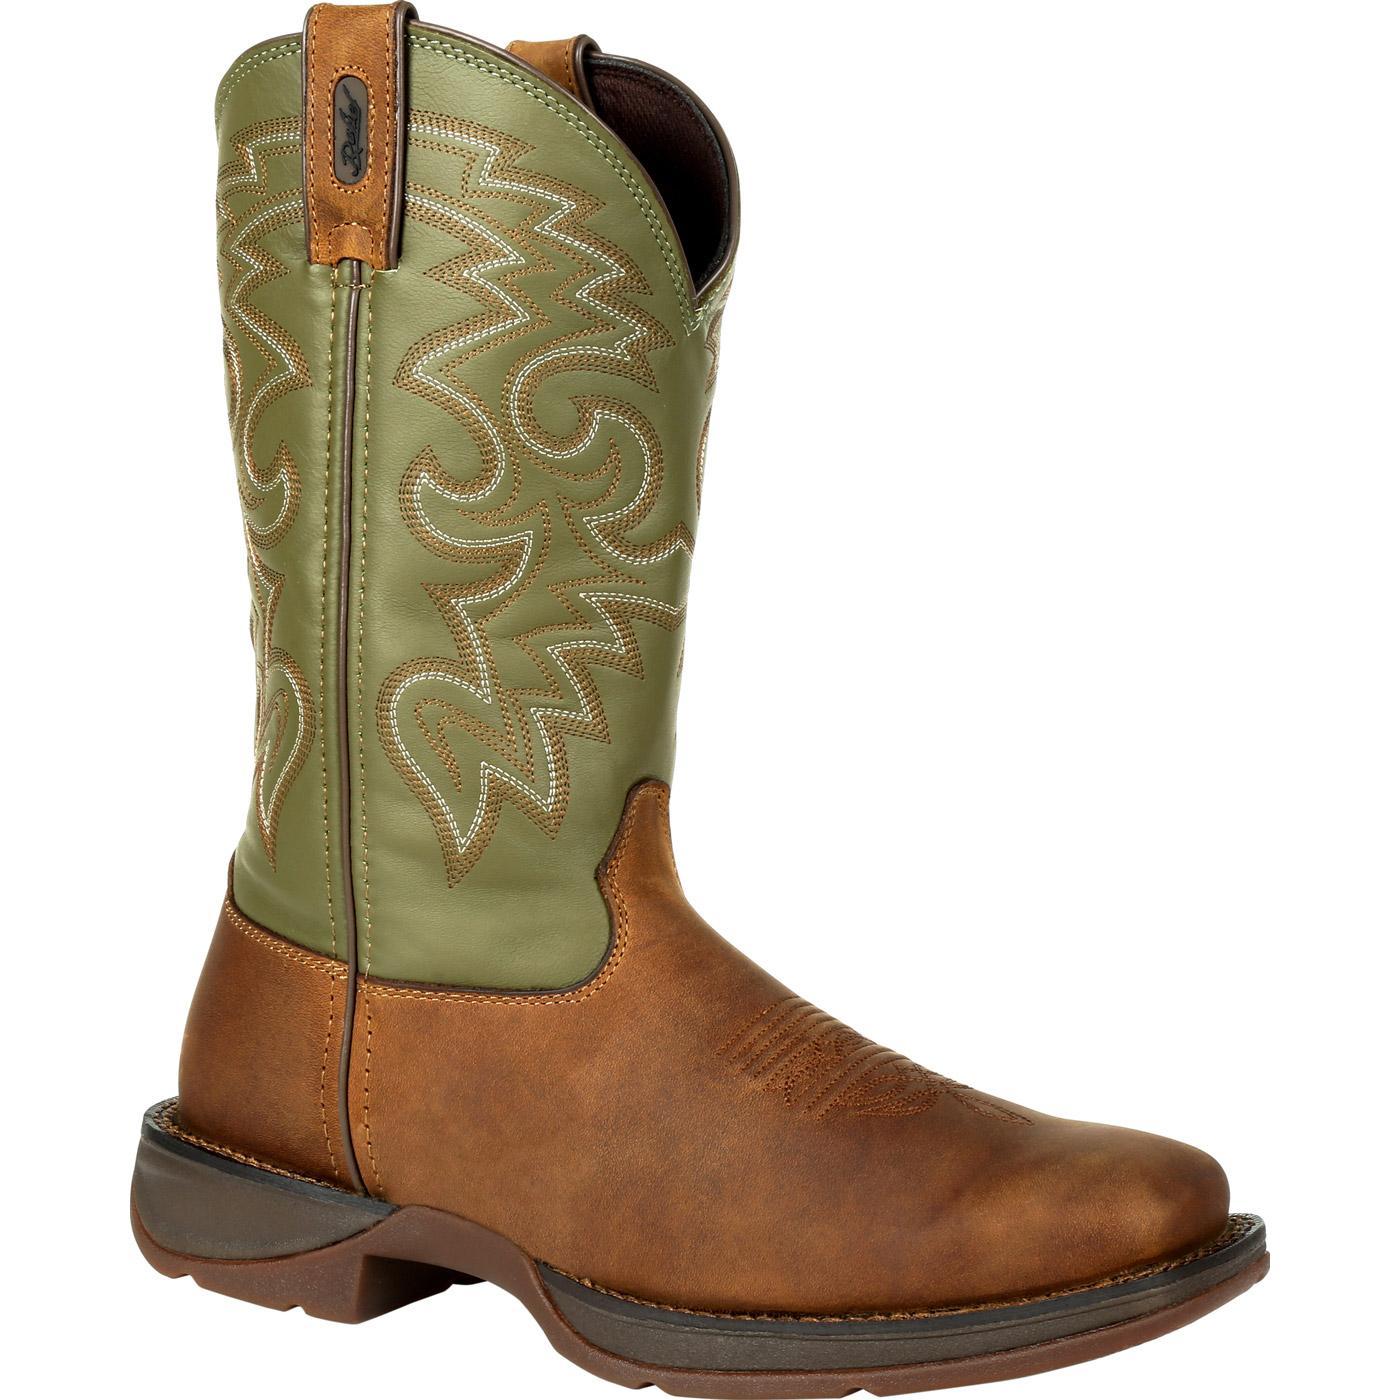 7ec814ca301a Rebel by Durango  Men s Green and Brown Comfort Western Boot